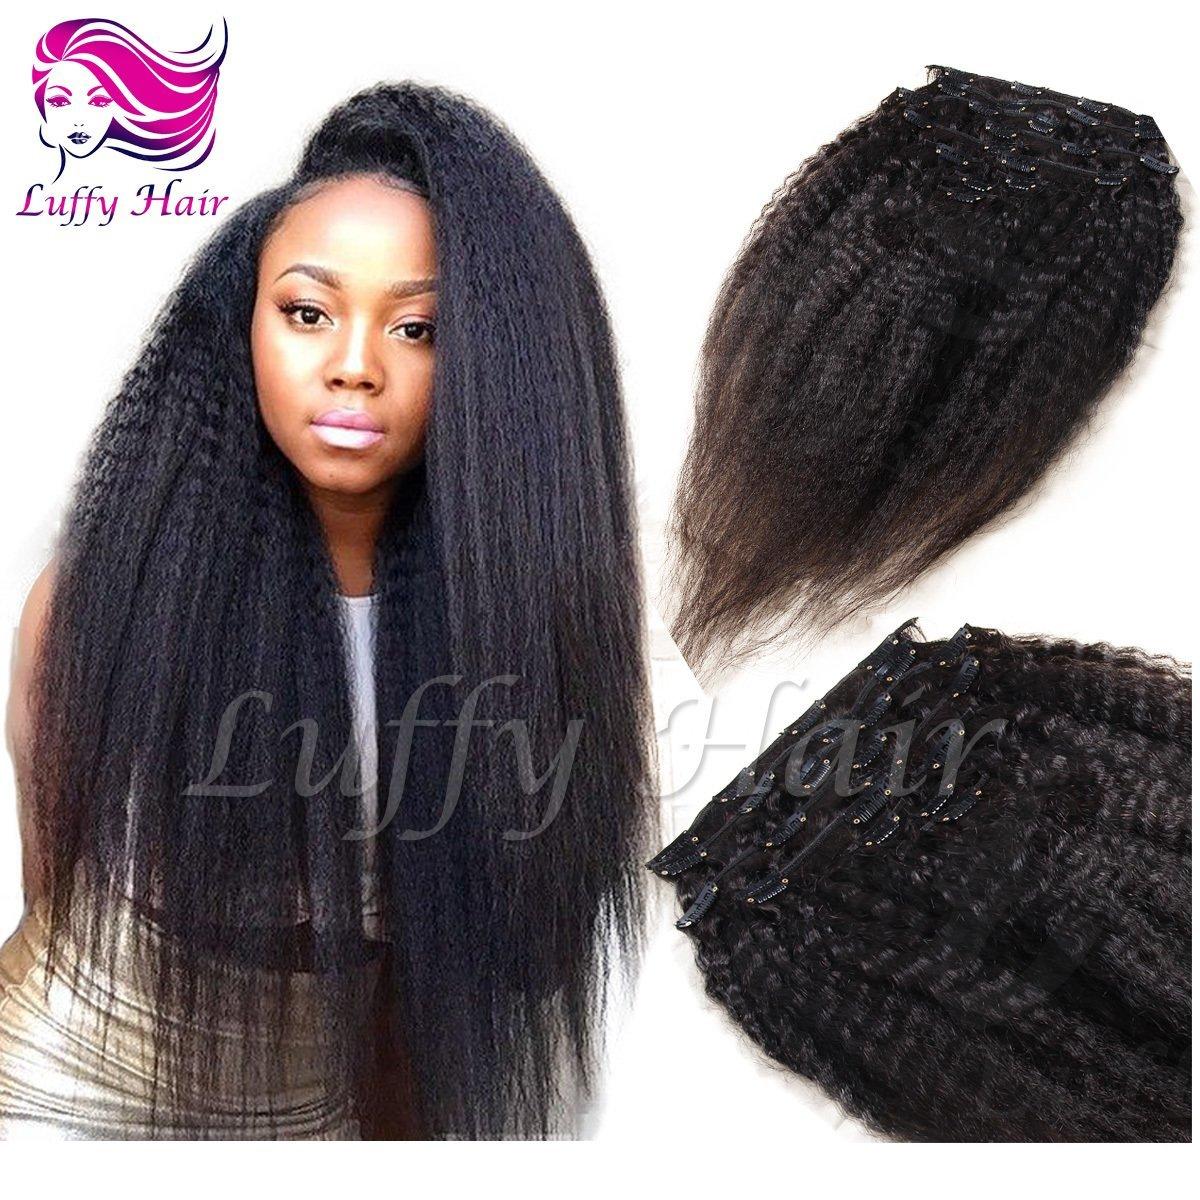 8A Virgin Human Hair Kinky Straight Clip In Hair Extensions - KIL006